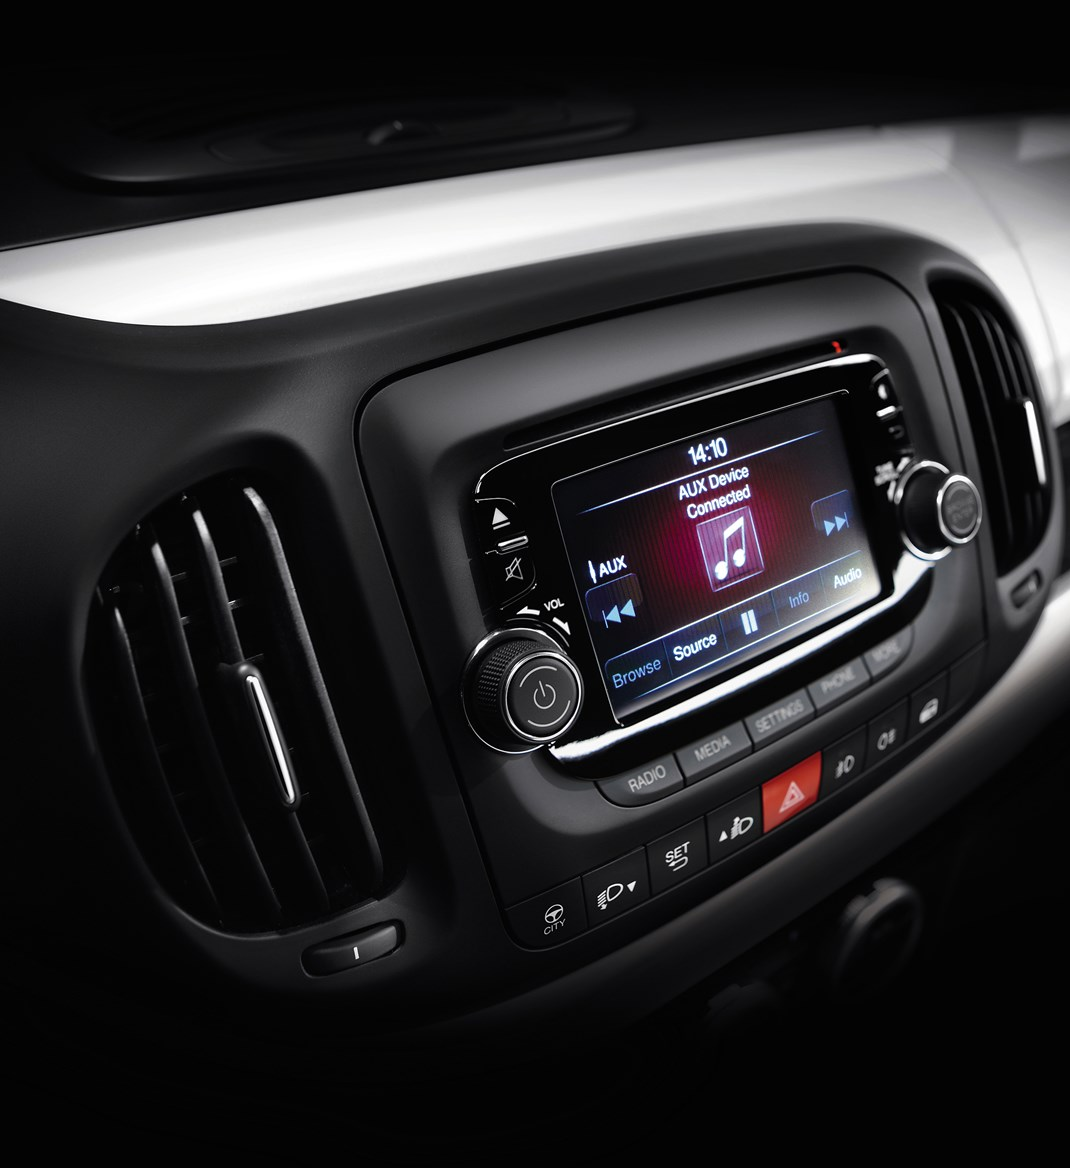 2019 Fiat 500l: Fiat 500L (2019) MPG, Running Costs, Economy & CO2